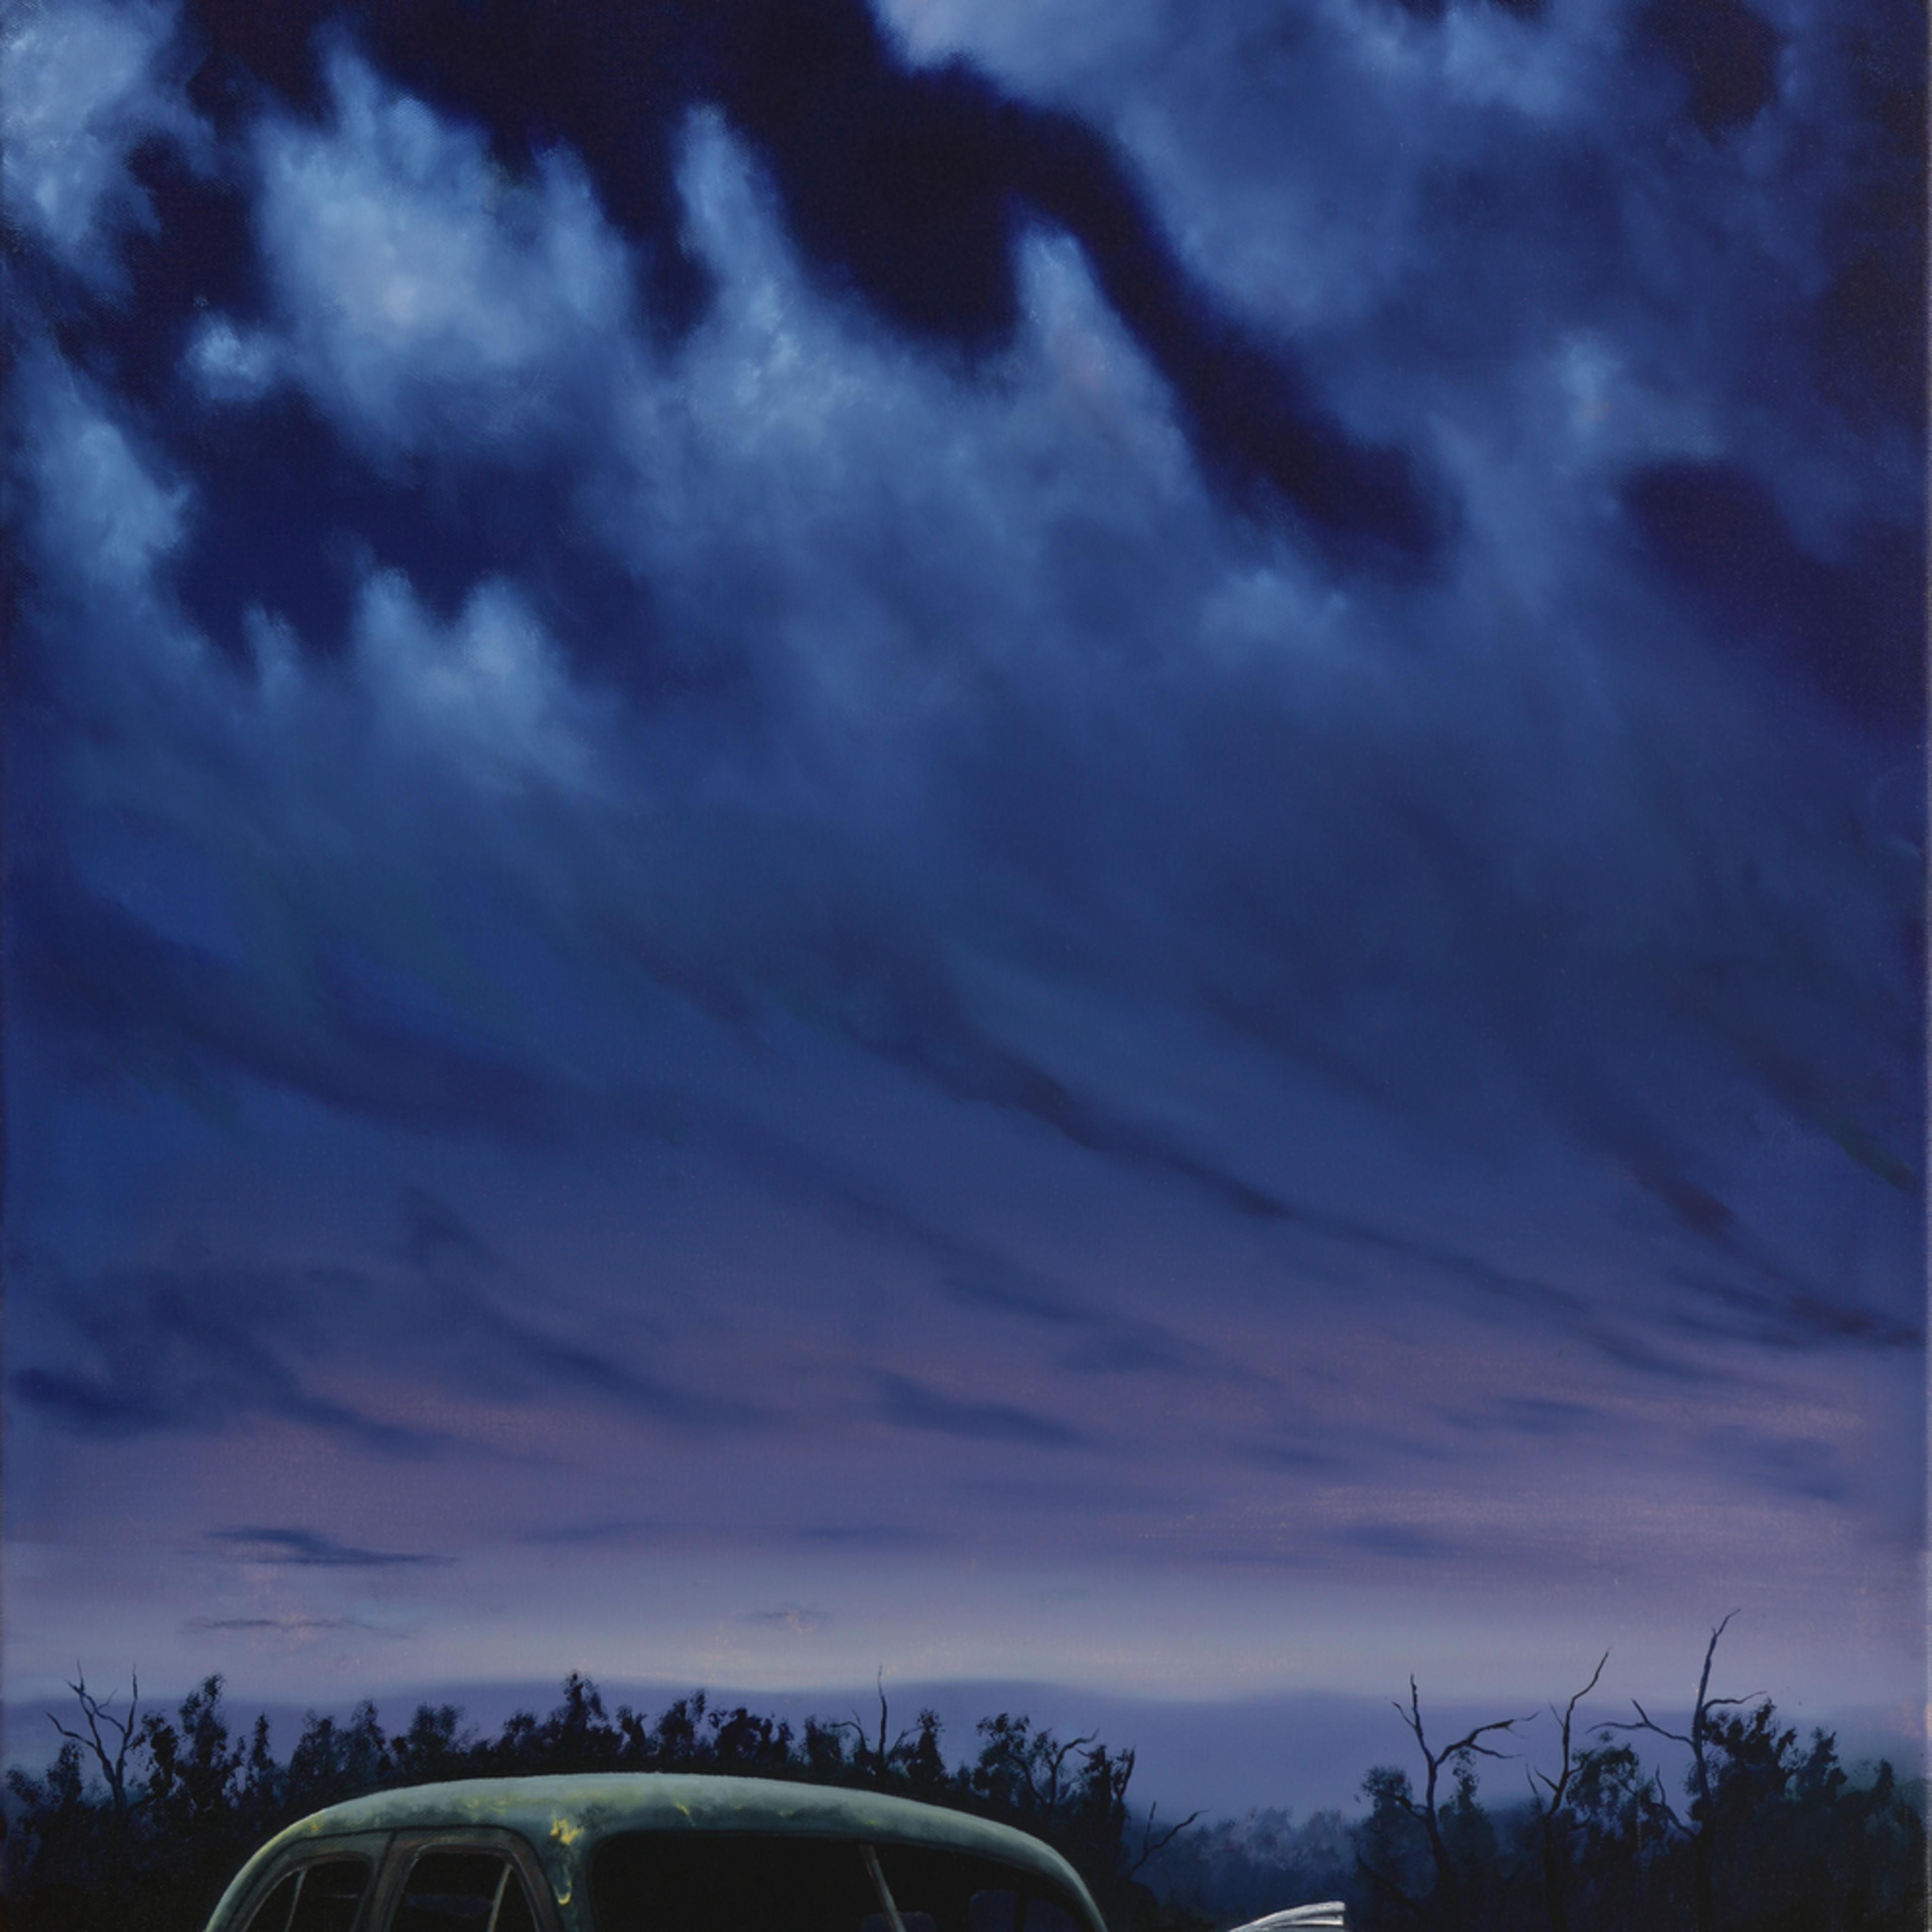 11  still in the night oil on canvas by monica marquez gatica mmg art studio ndpzin